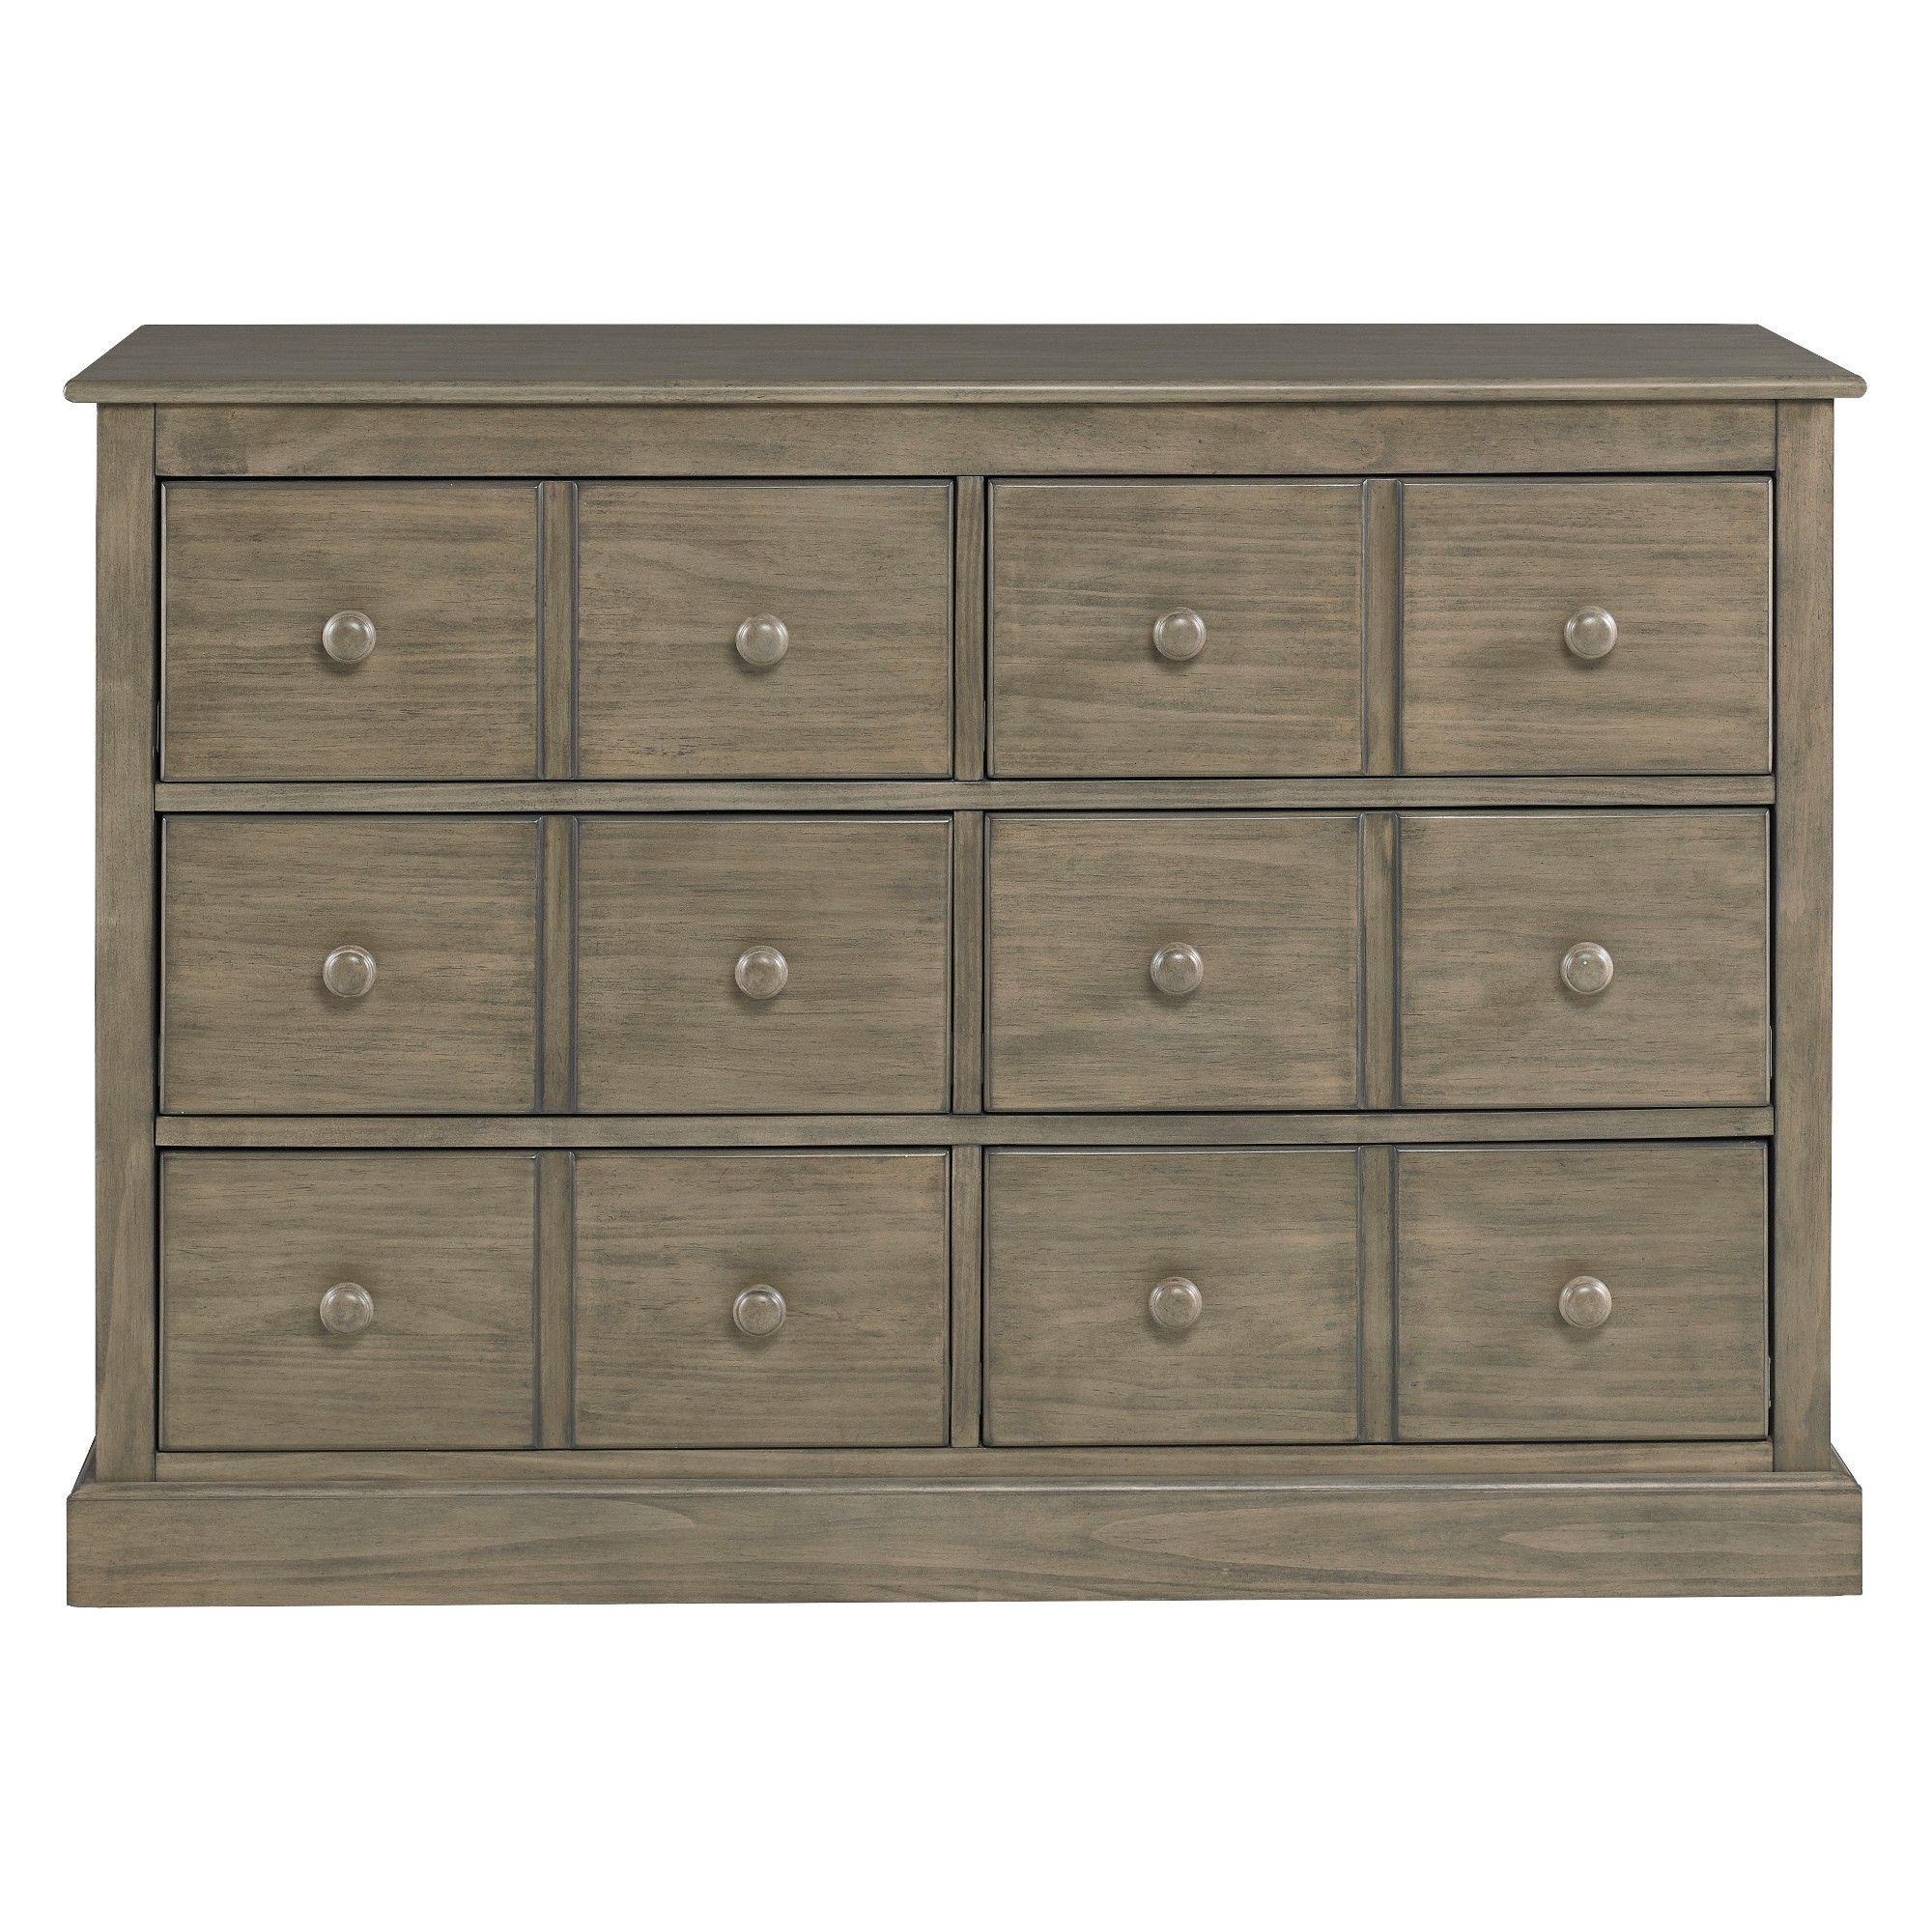 FisherPrice 6Drawer Double Dresser Vintage Gray, White